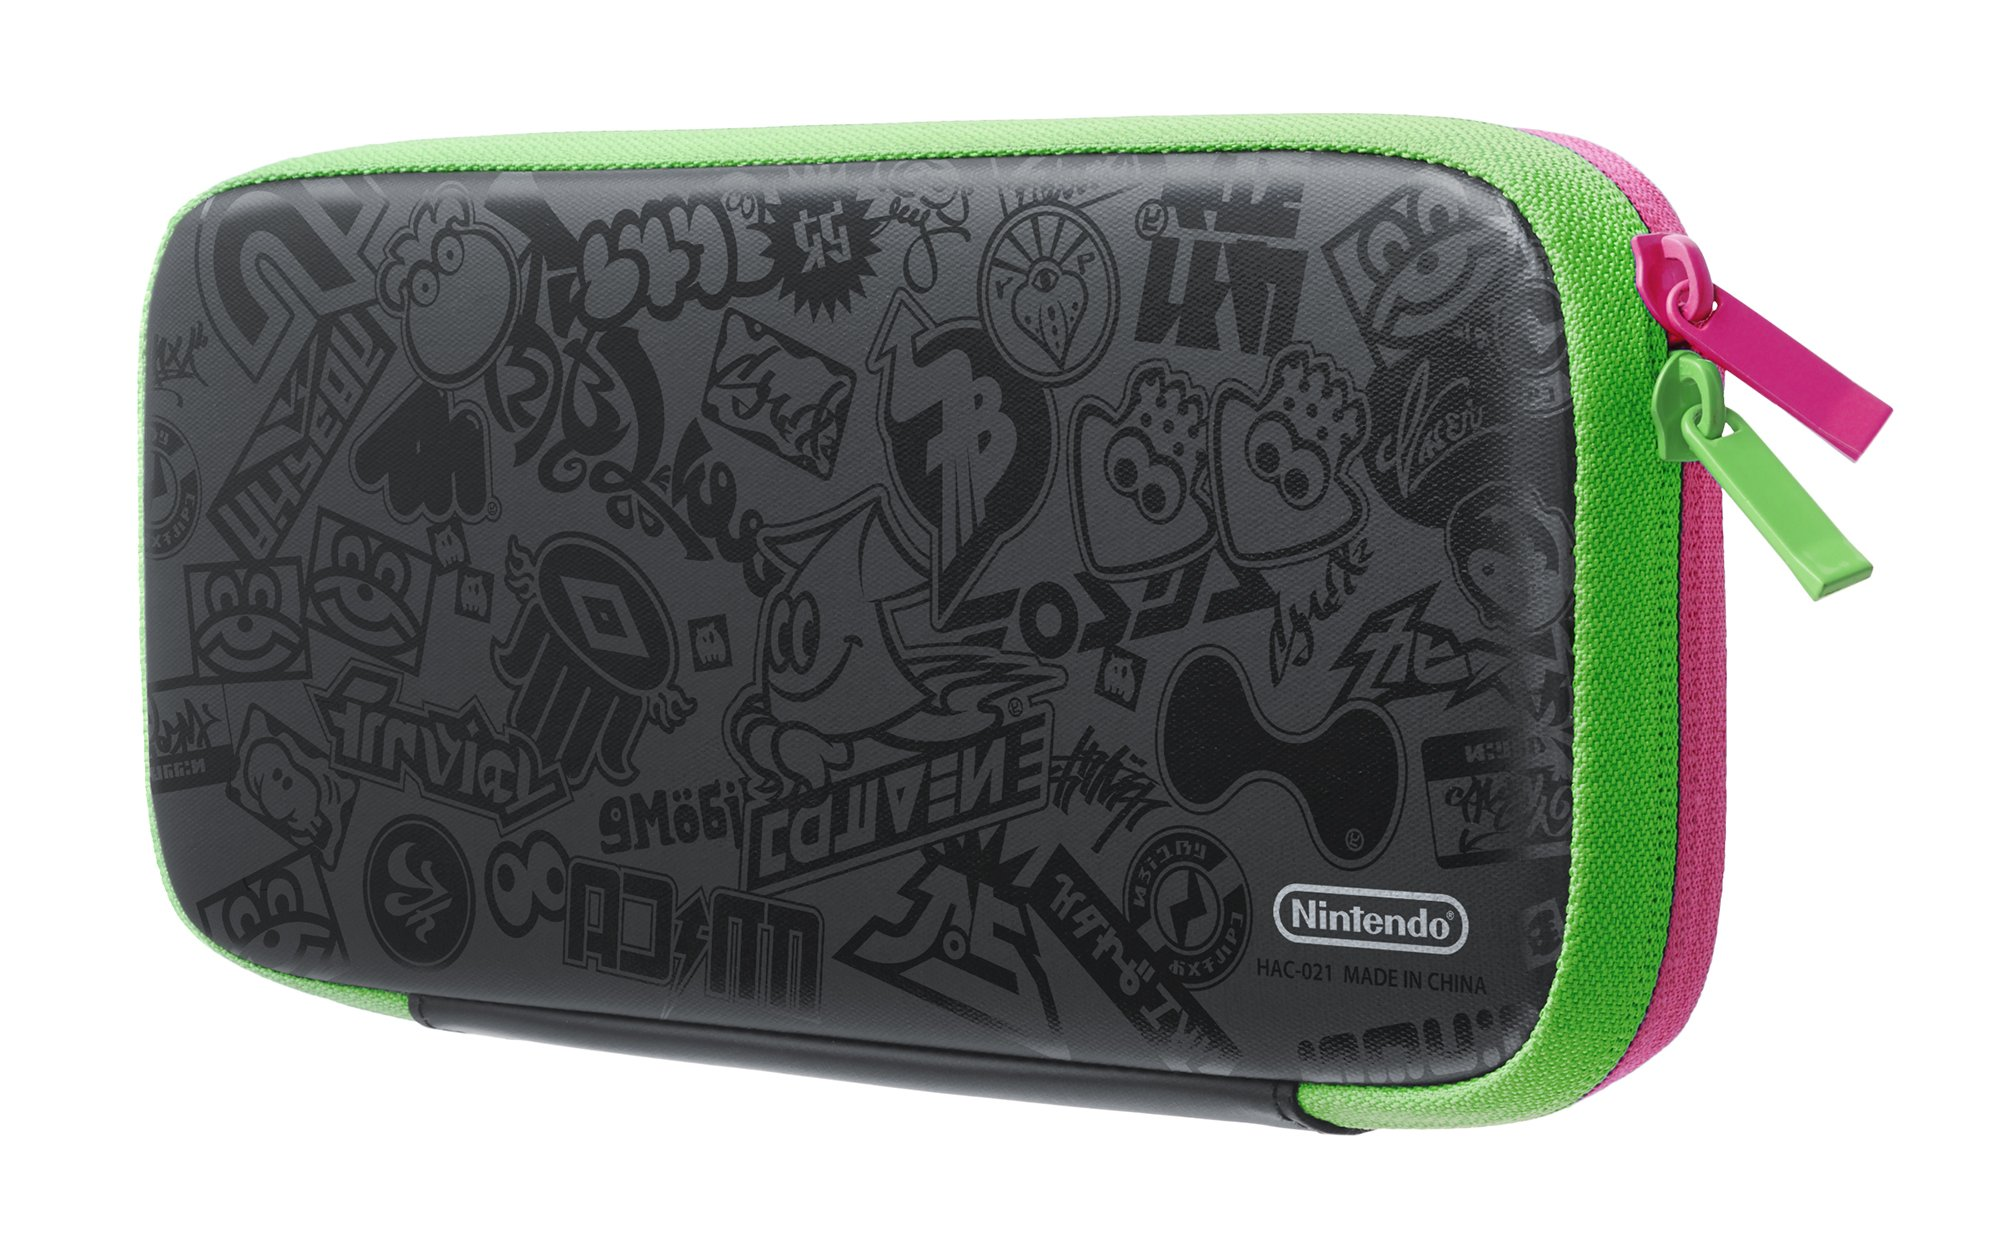 Nintendo Switch Hardware with Splatoon 2 + Neon Green/Neon Pink Joy-Cons (Nintendo Switch) by Nintendo (Image #8)